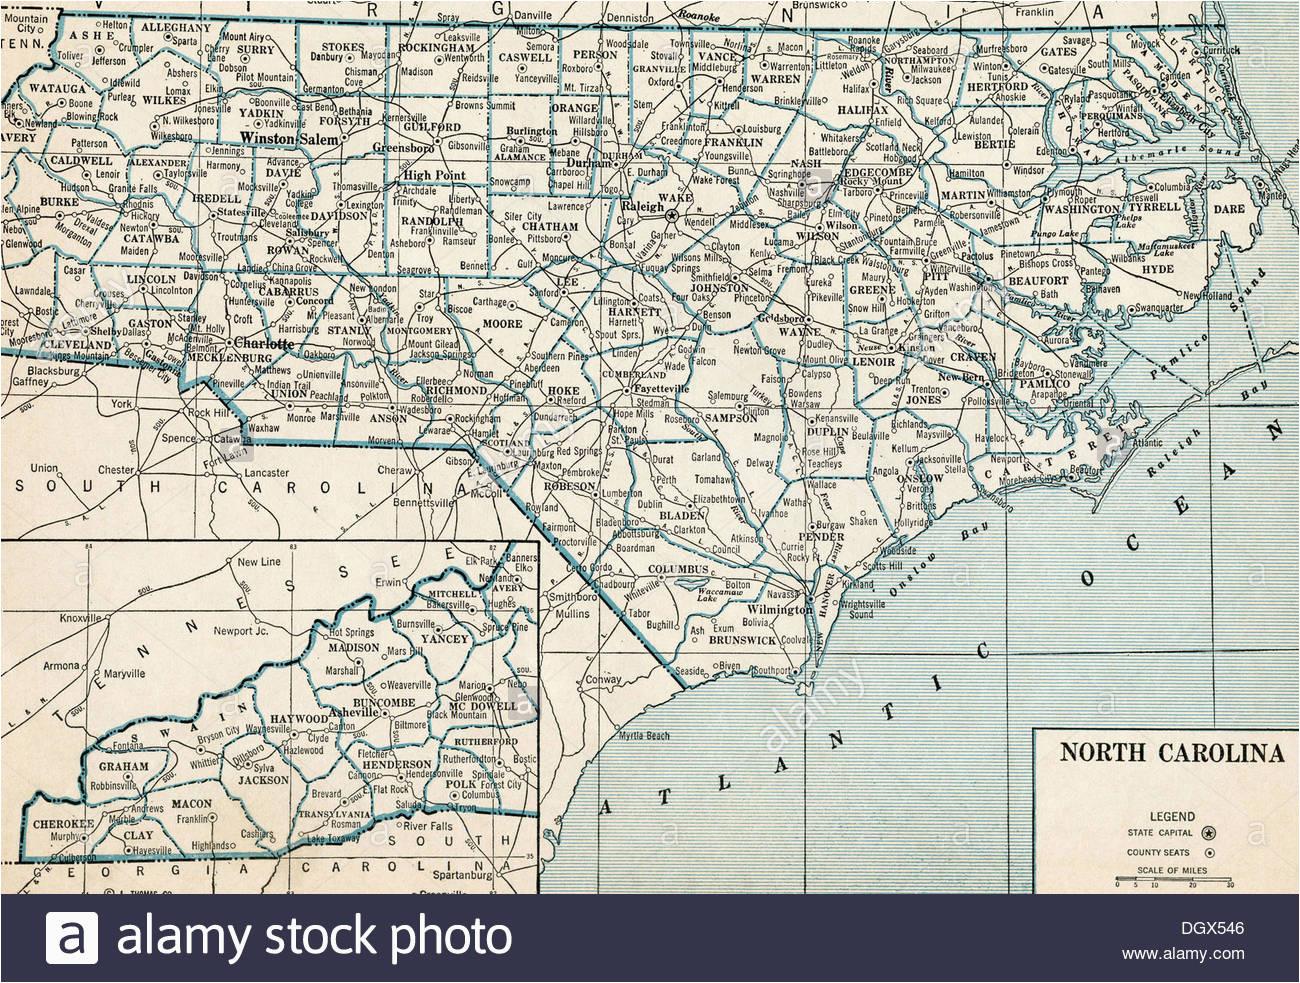 north carolina state map stockfotos north carolina state map